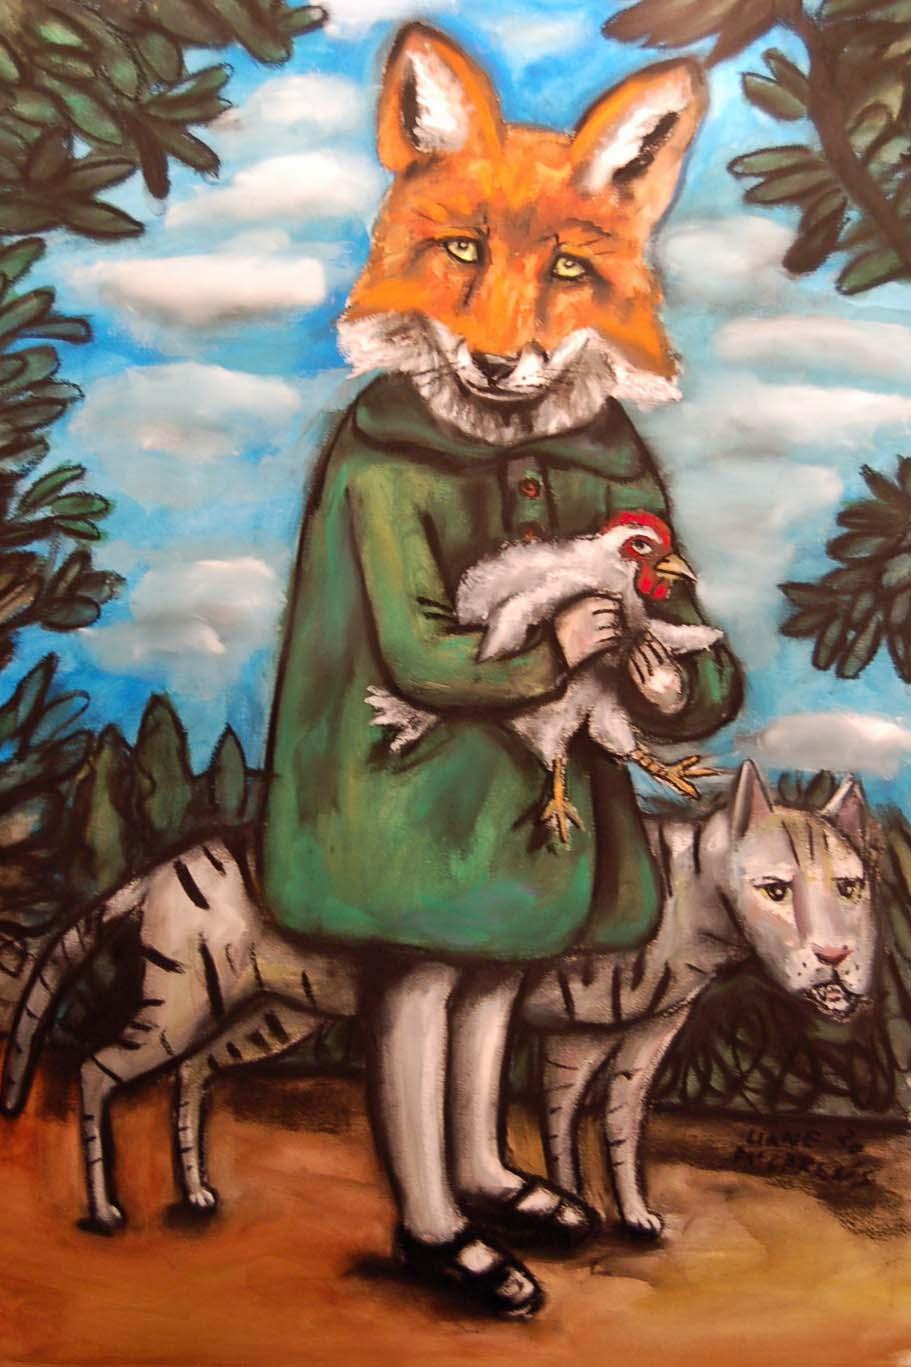 True Fox, a self portrait